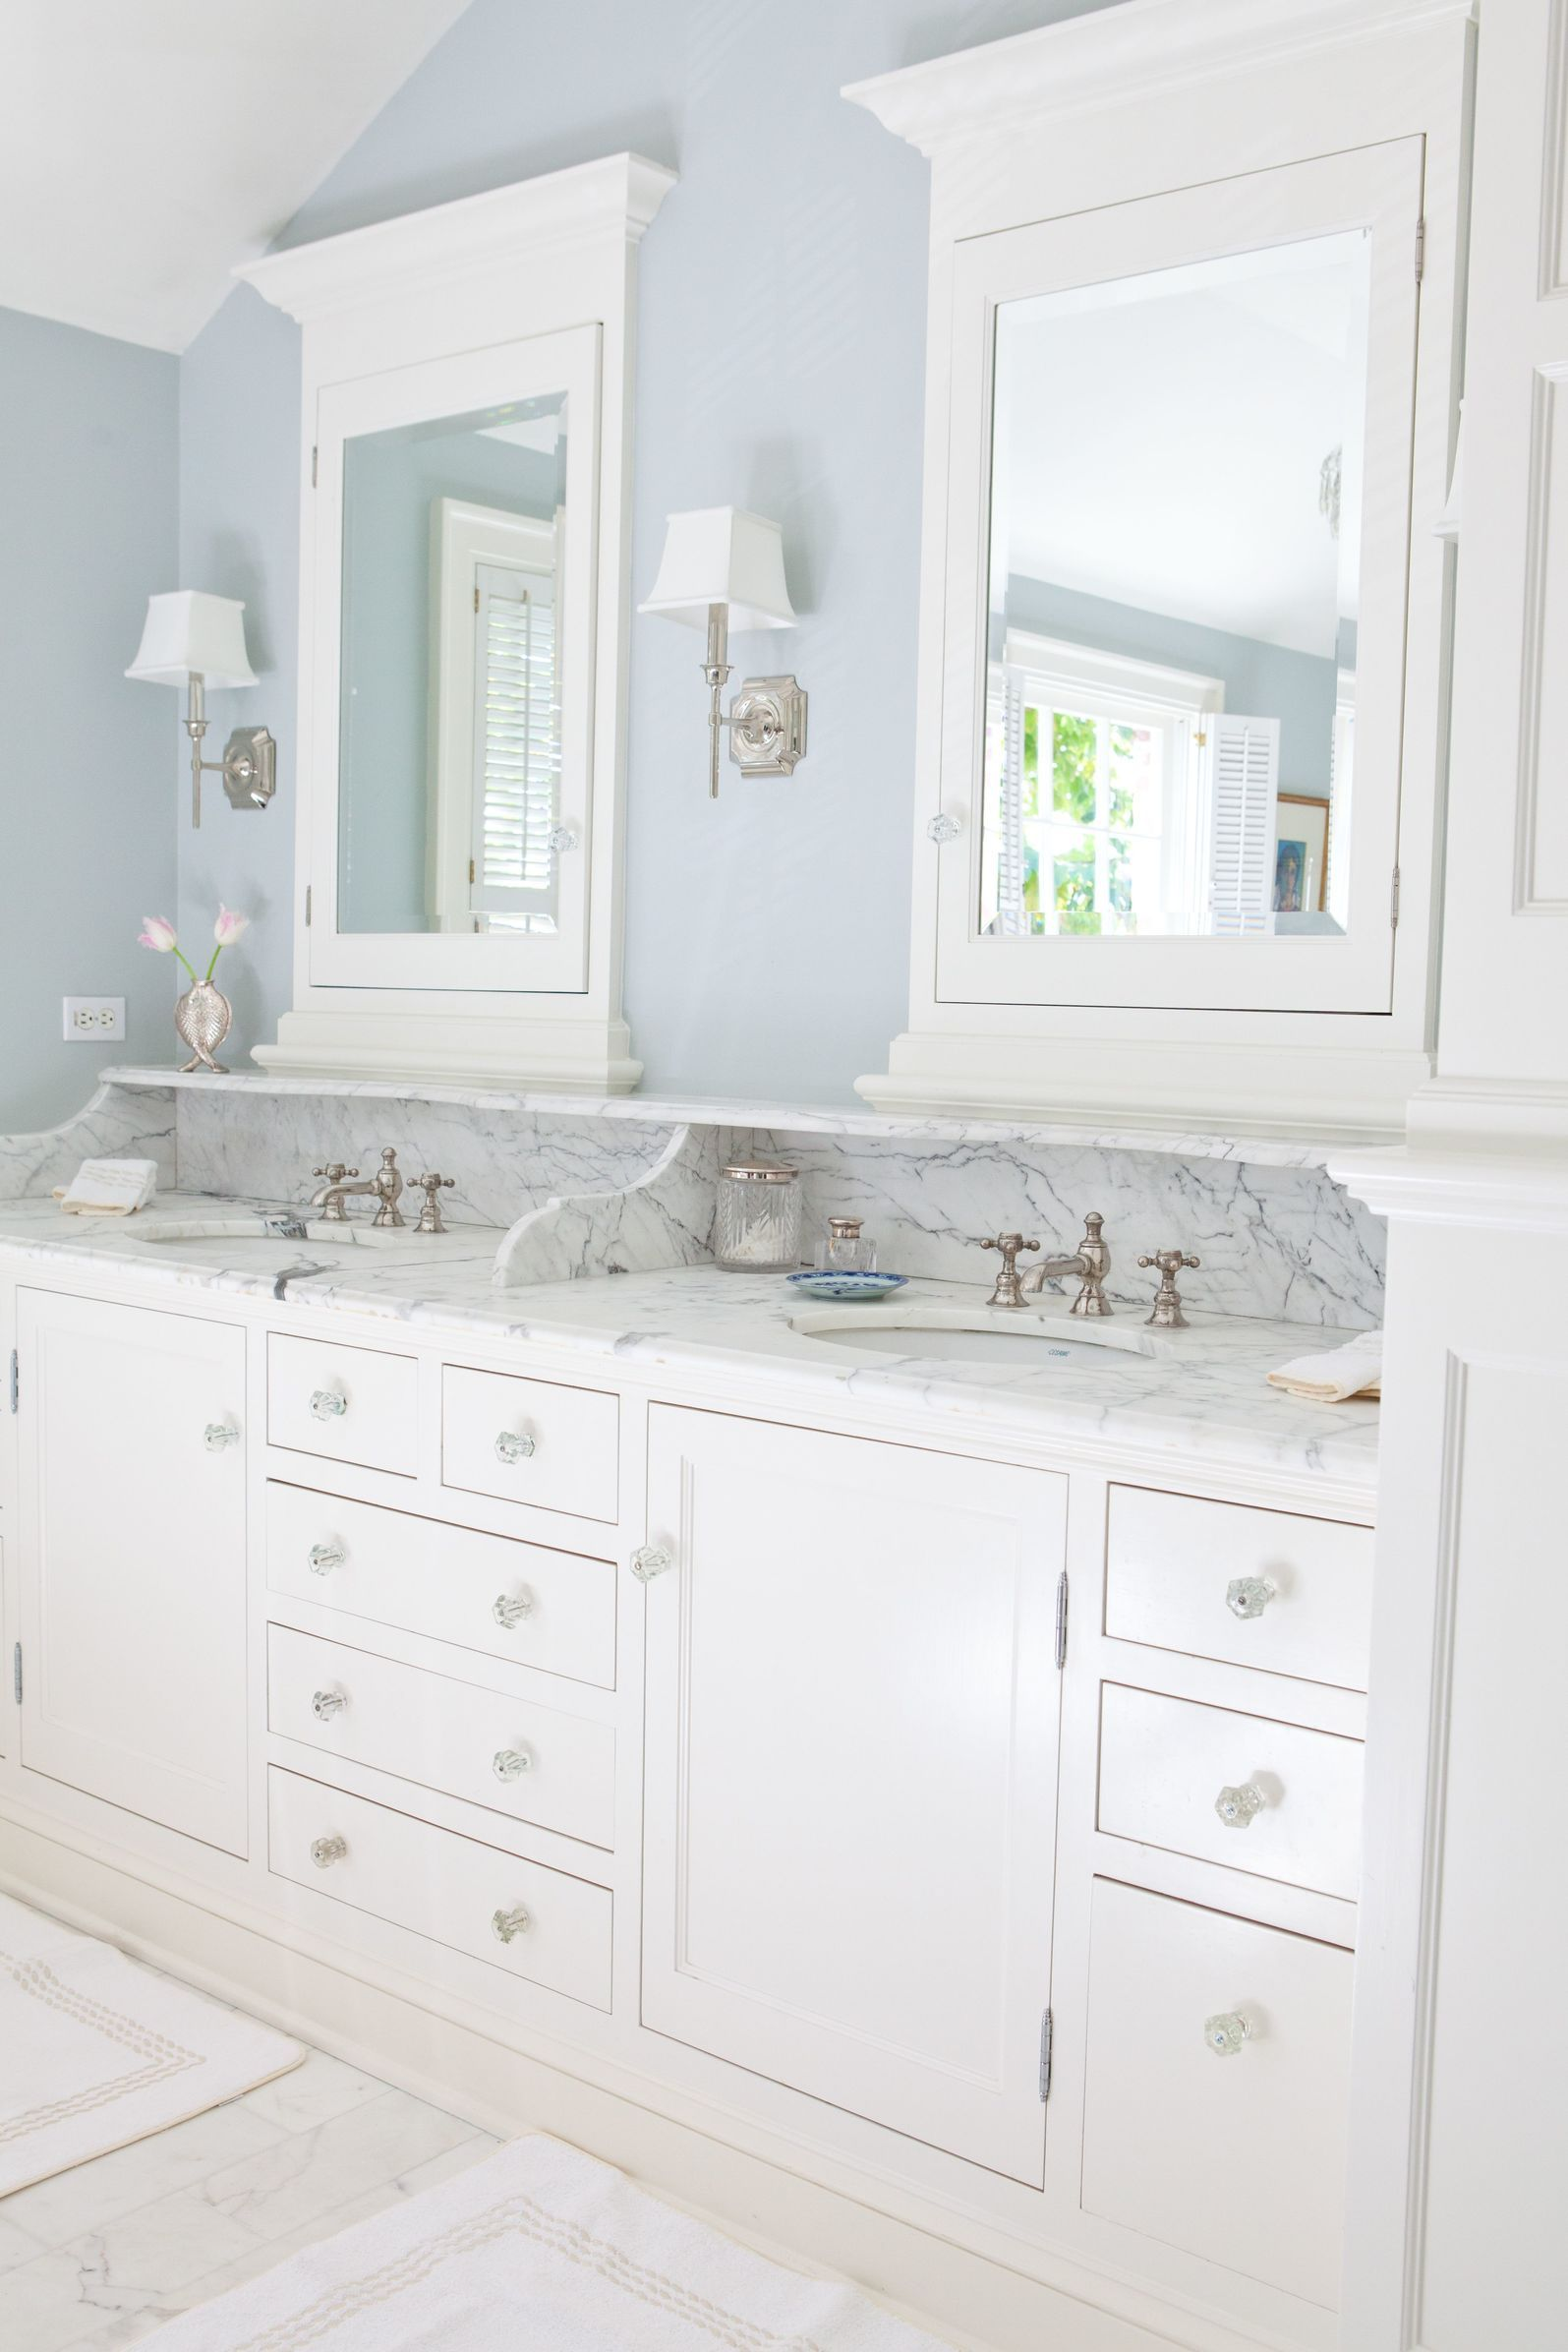 traditional designer bathroom vanities. Newport Beach Master Bath 2 - Traditional Bathroom Images By Kathleen DiPaolo Designs   Designer Vanities